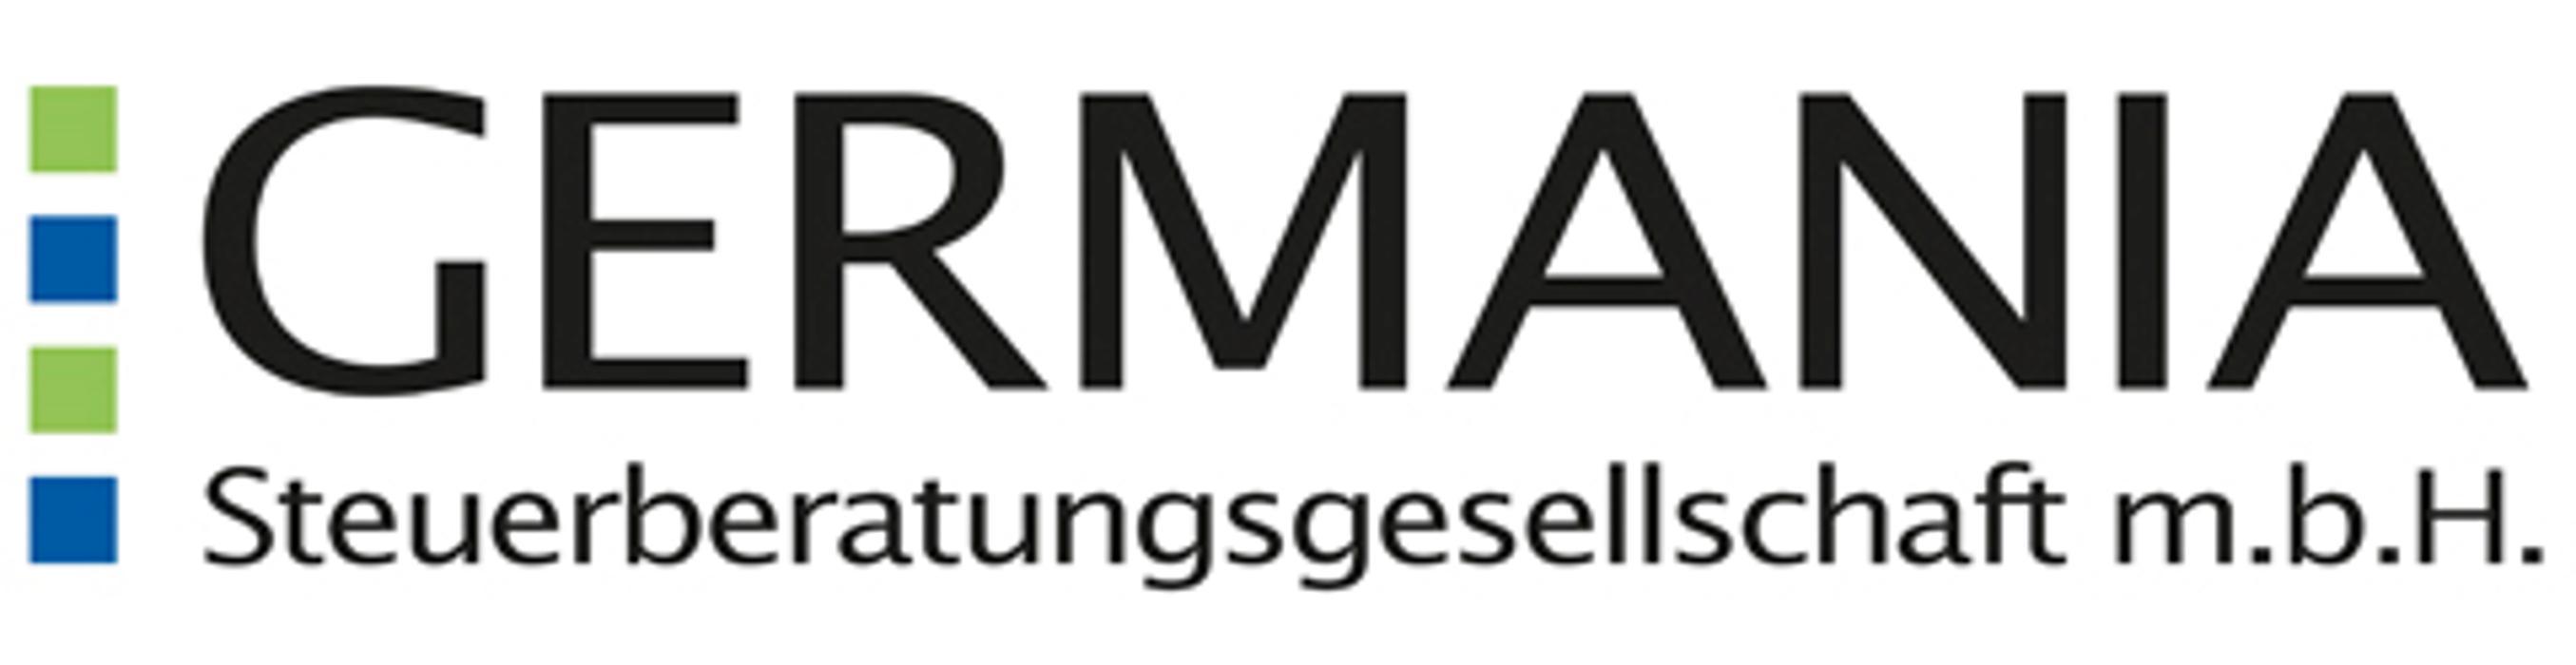 Bild zu Germania Steuerberatungsgesellschaft mbH in Nürnberg